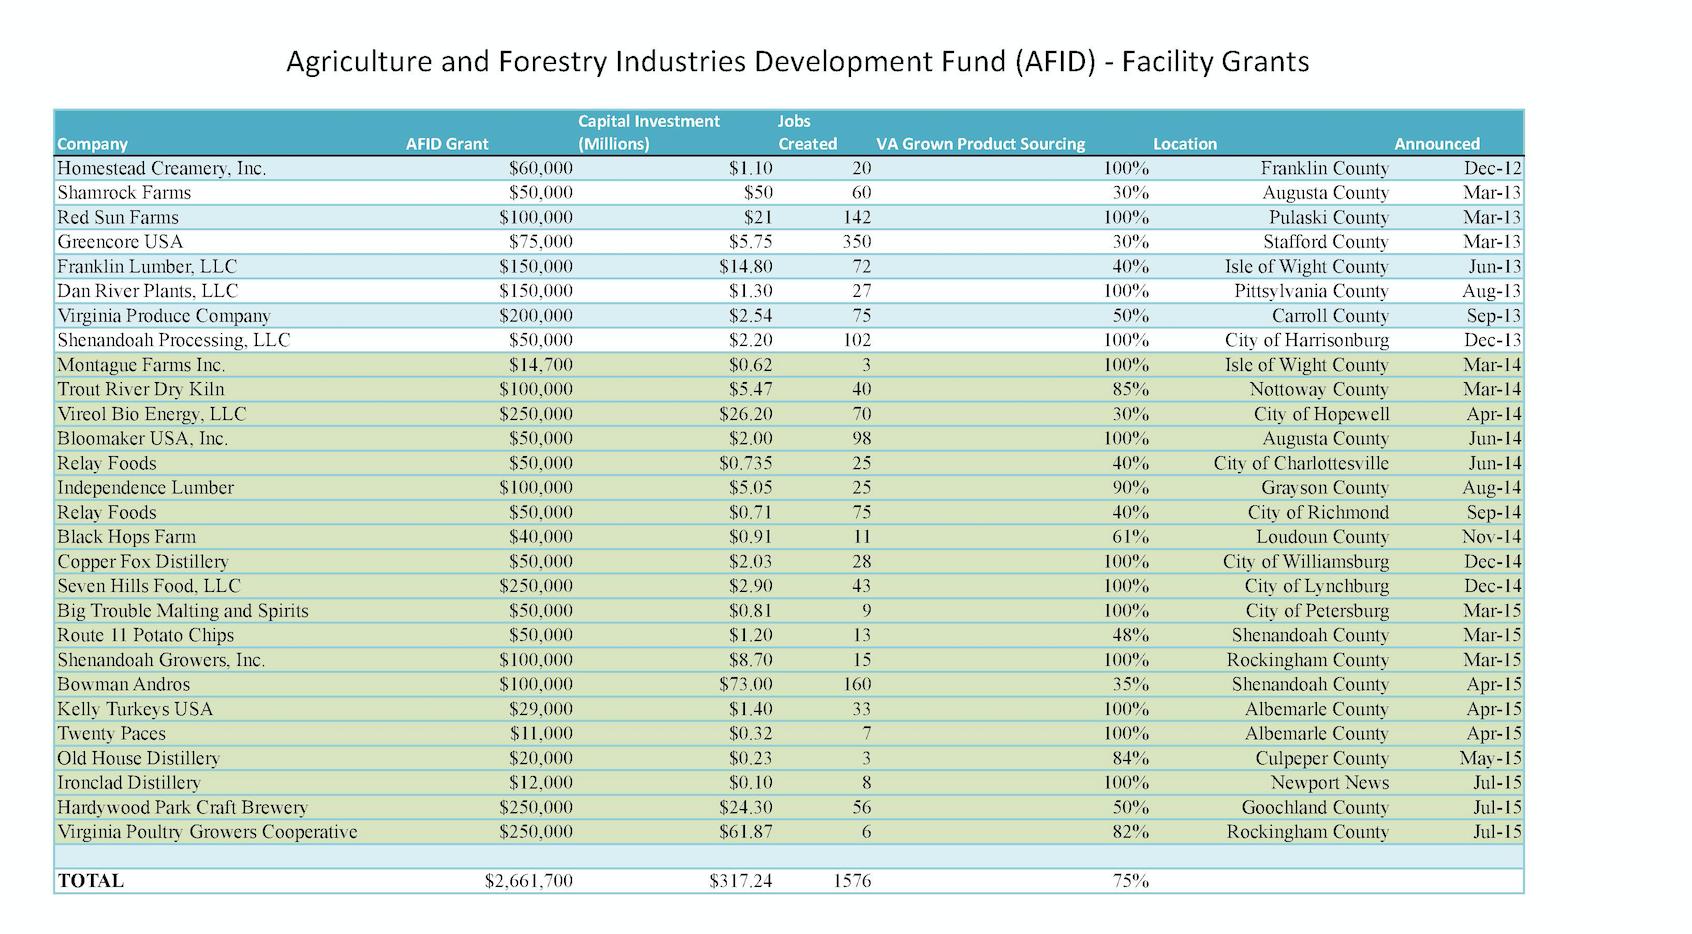 AFID_Facility_Grants.png